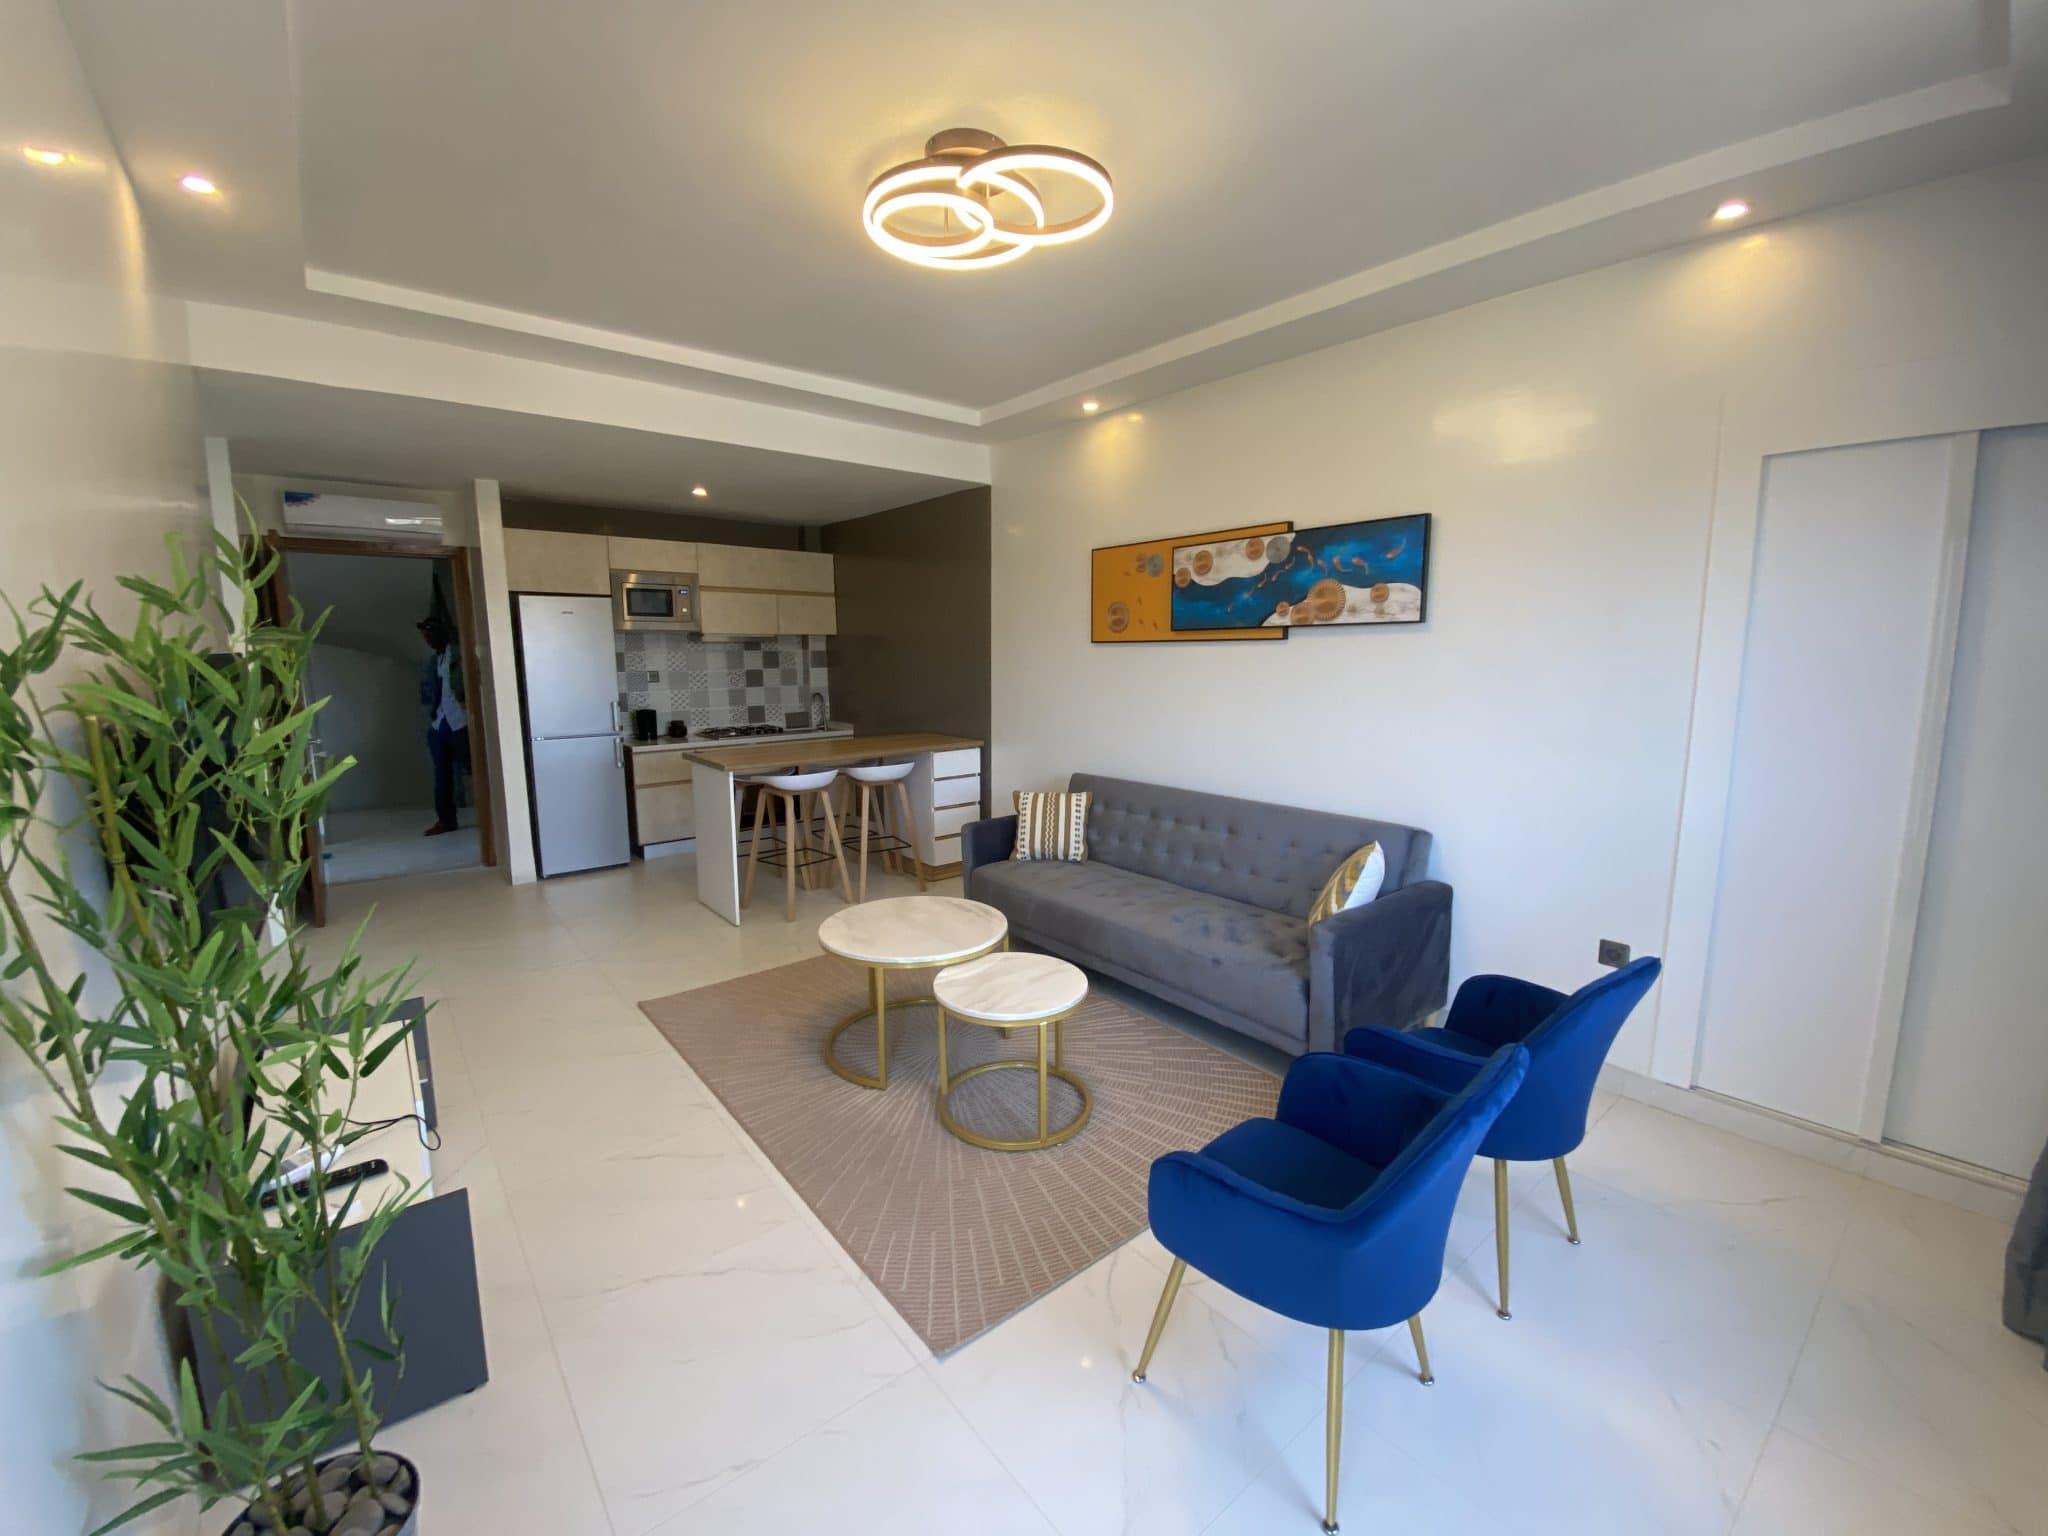 Studio meublé à louer DAkar Ngor-Almadies